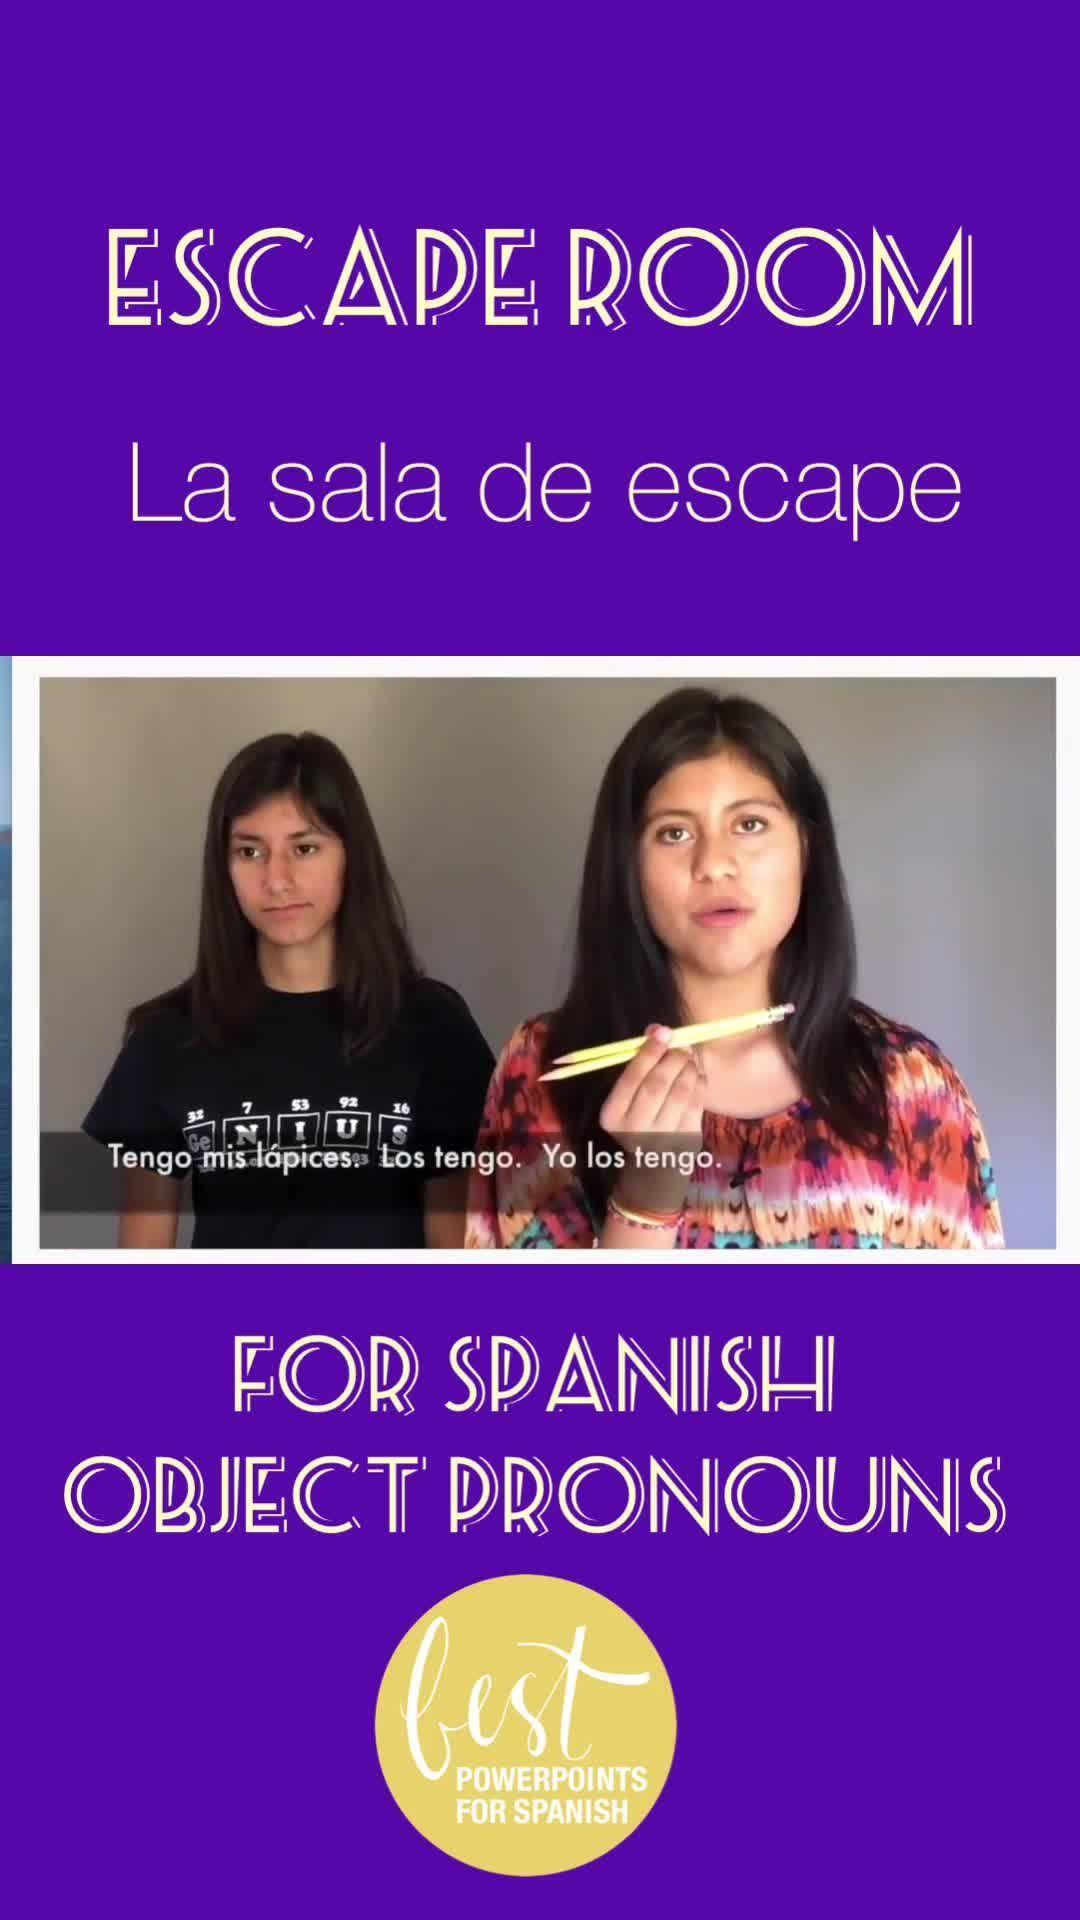 Spanish Escape Room For Object Pronouns Escape Object